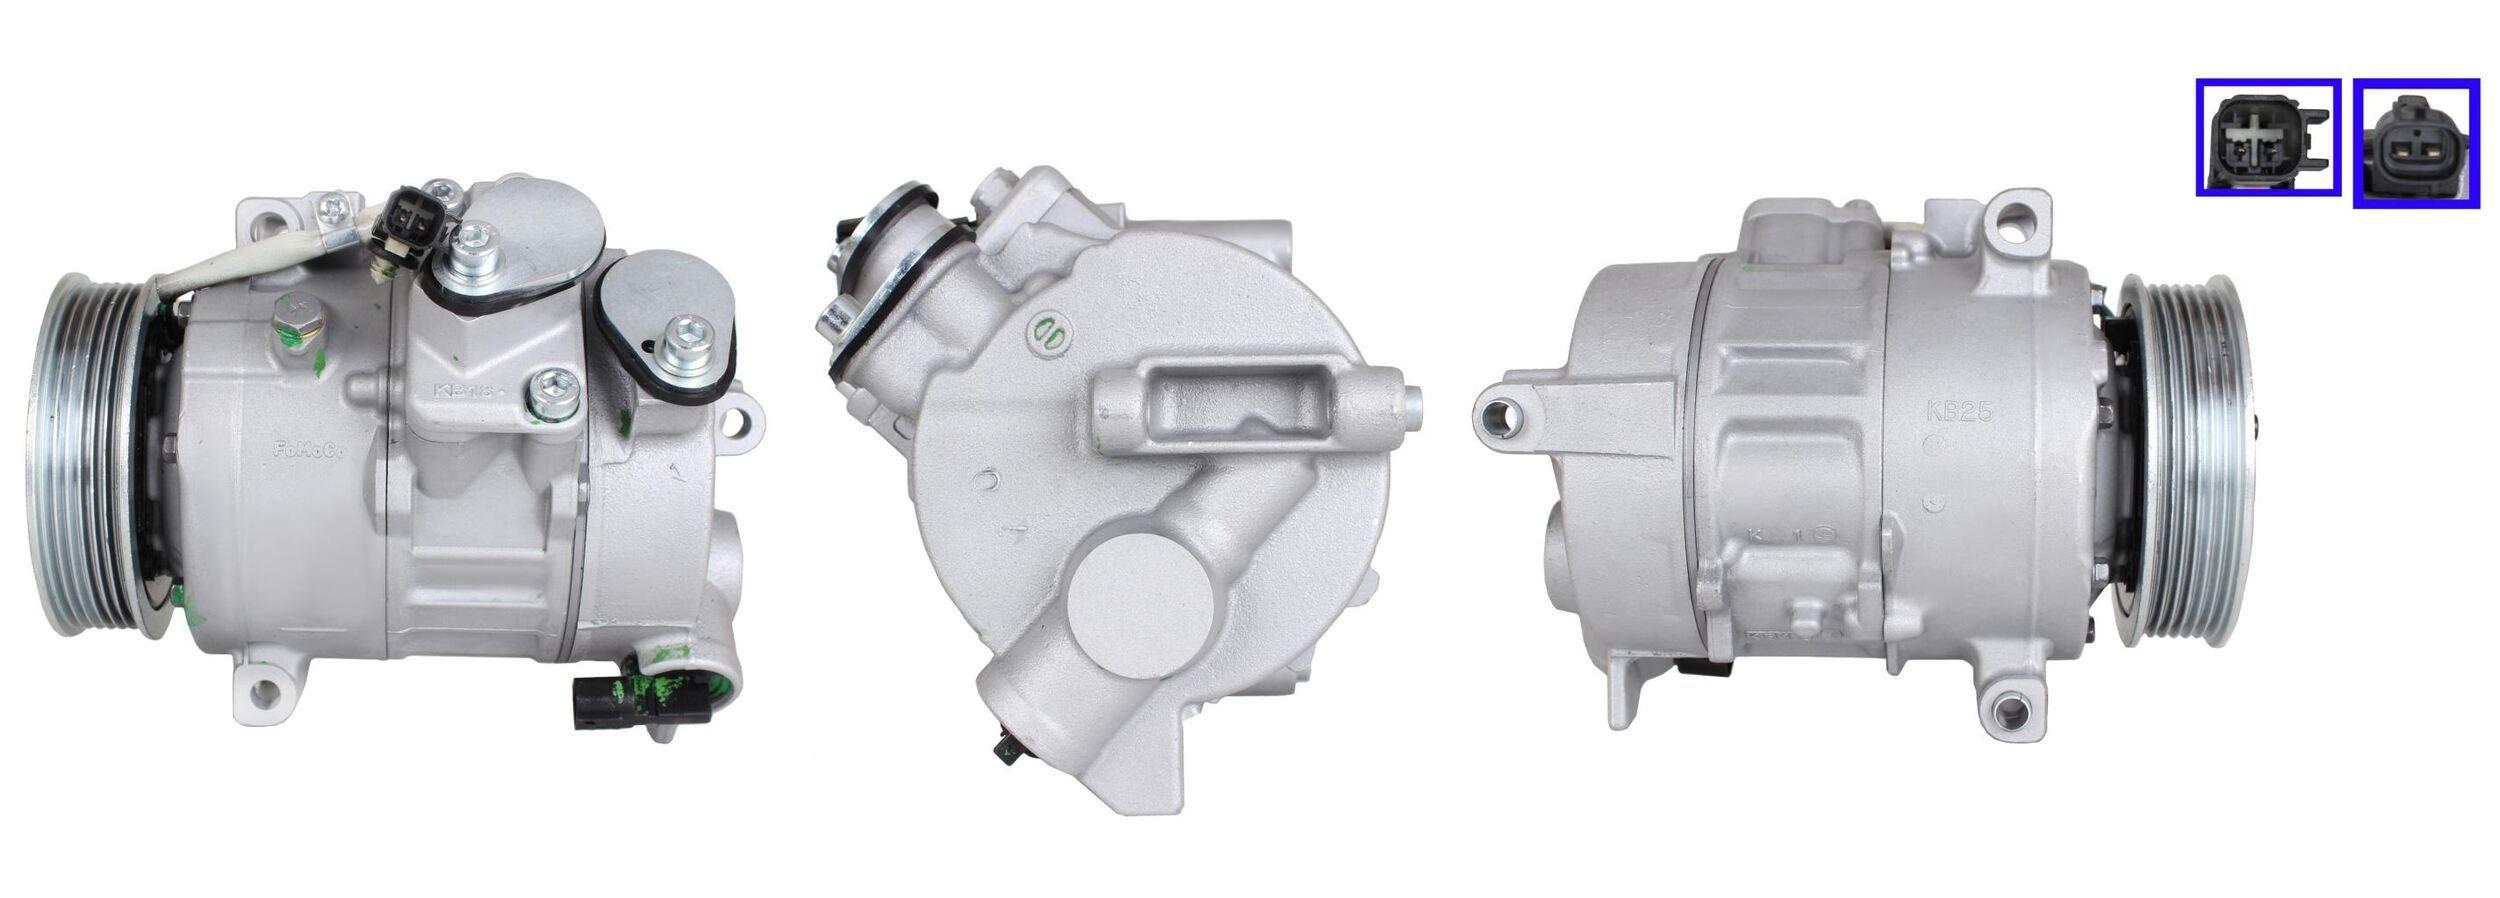 Original MITSUBISHI Kompressor Klimaanlage ACP01239